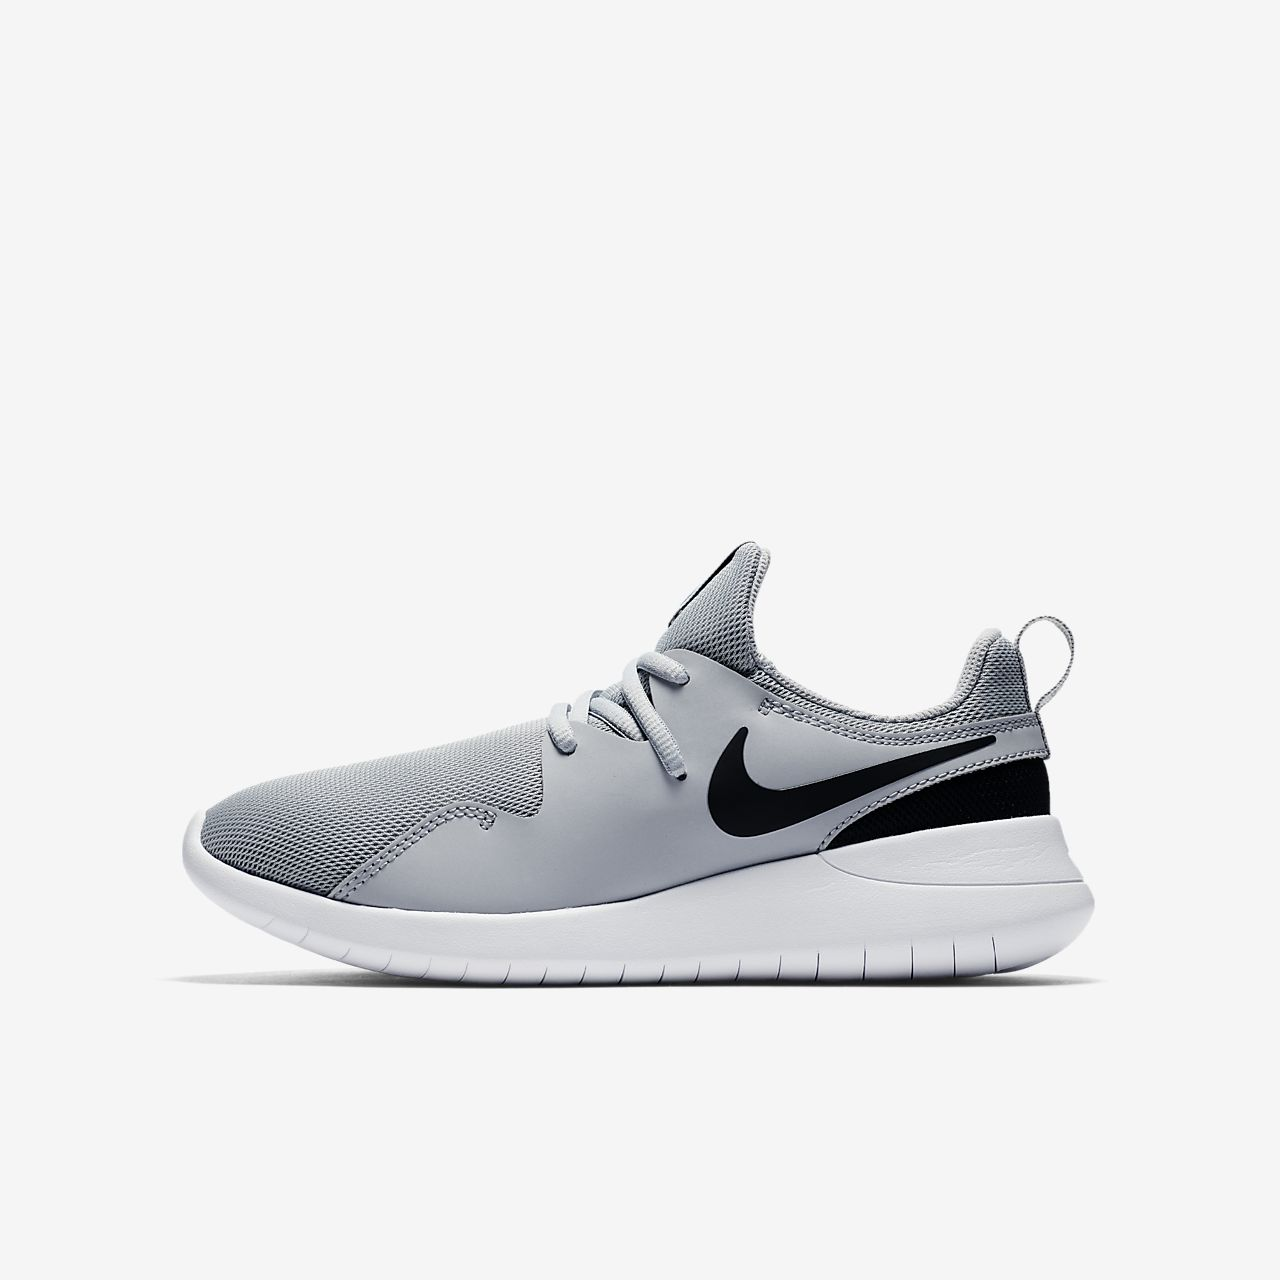 33467d14b1d Low Resolution Sapatilhas Nike Tessen Júnior Sapatilhas Nike Tessen Júnior